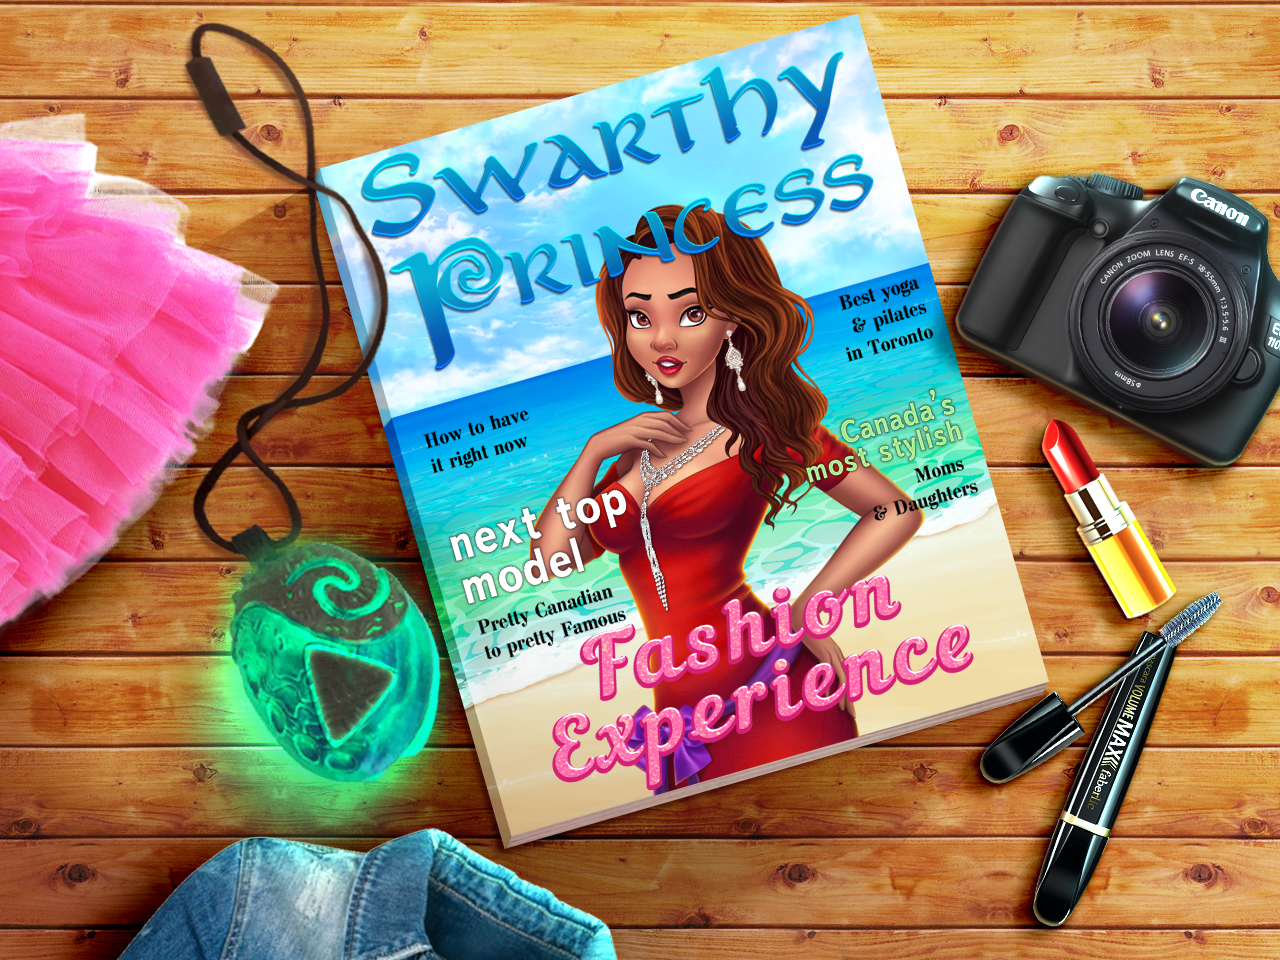 Swarthy Princess Fashion Experience